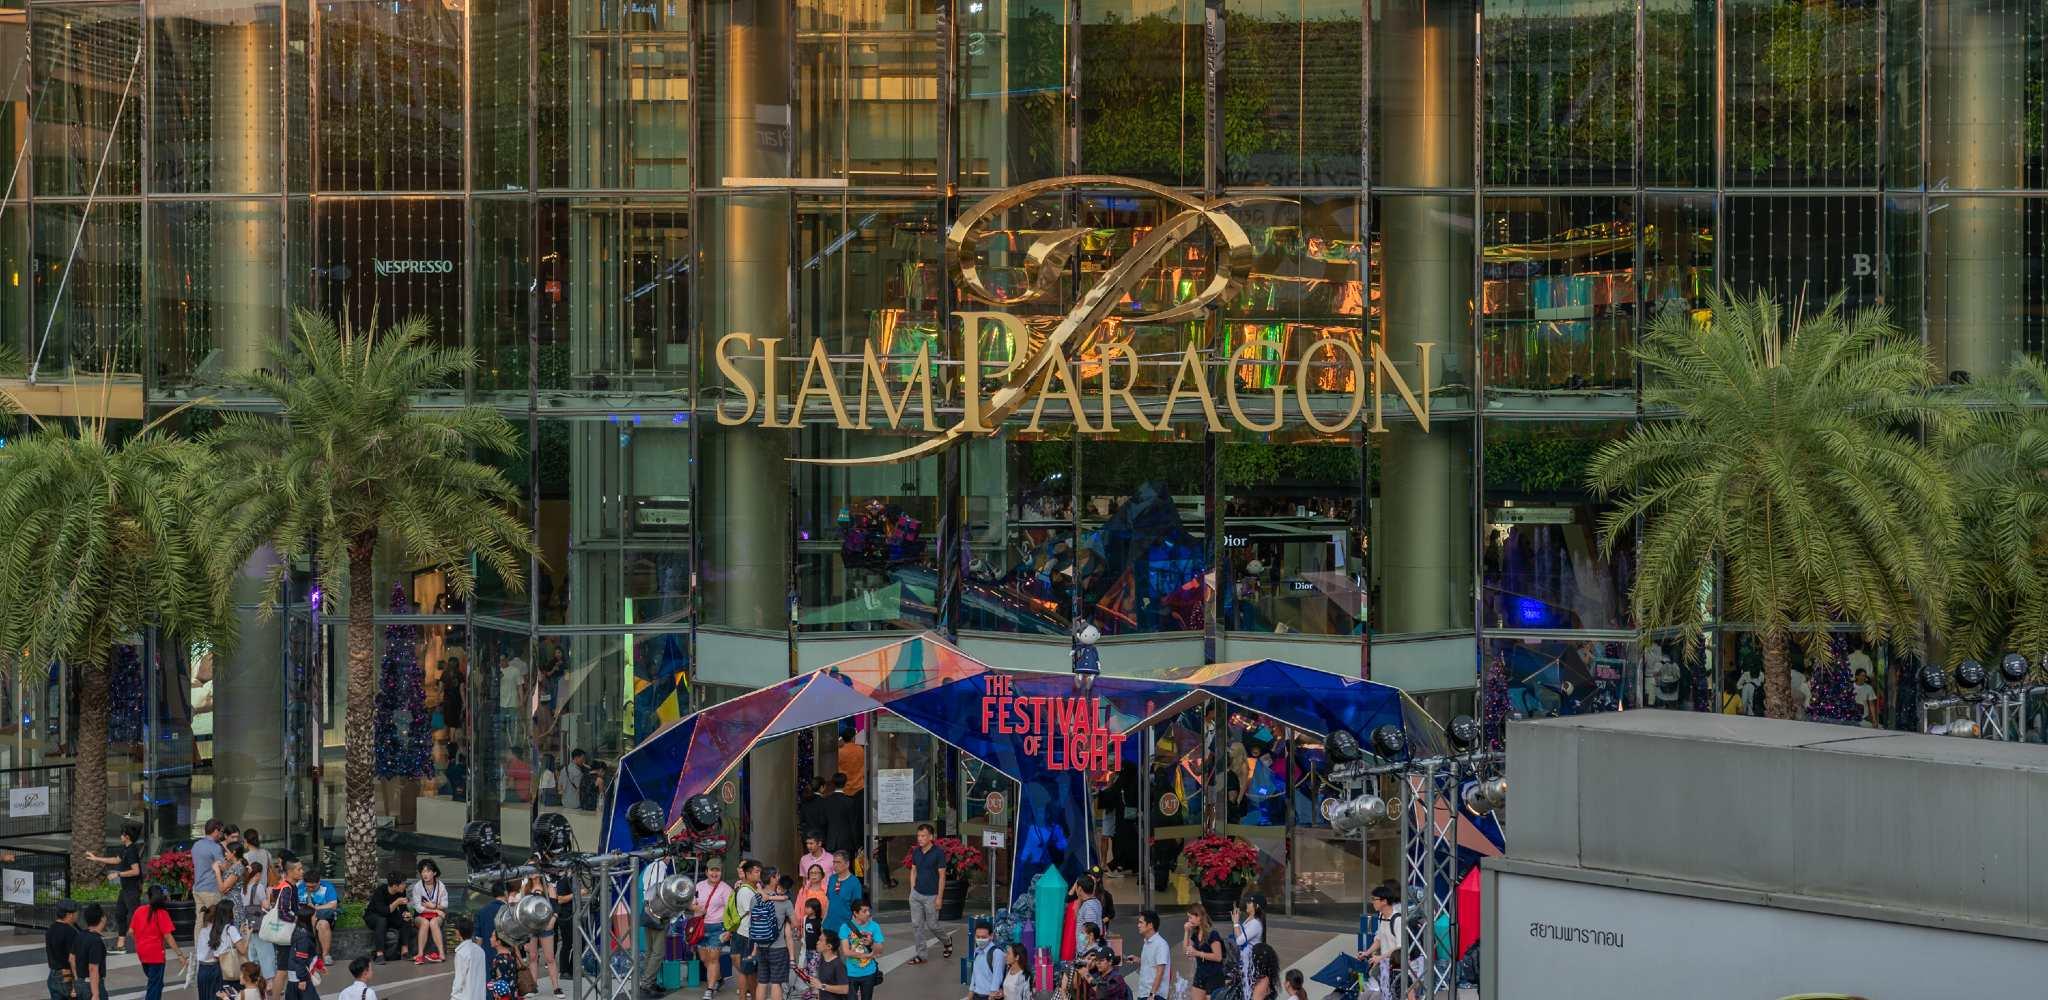 De hoofdingang van Siam Paragon gelegen in Siam Square in Bangkok, Thailand